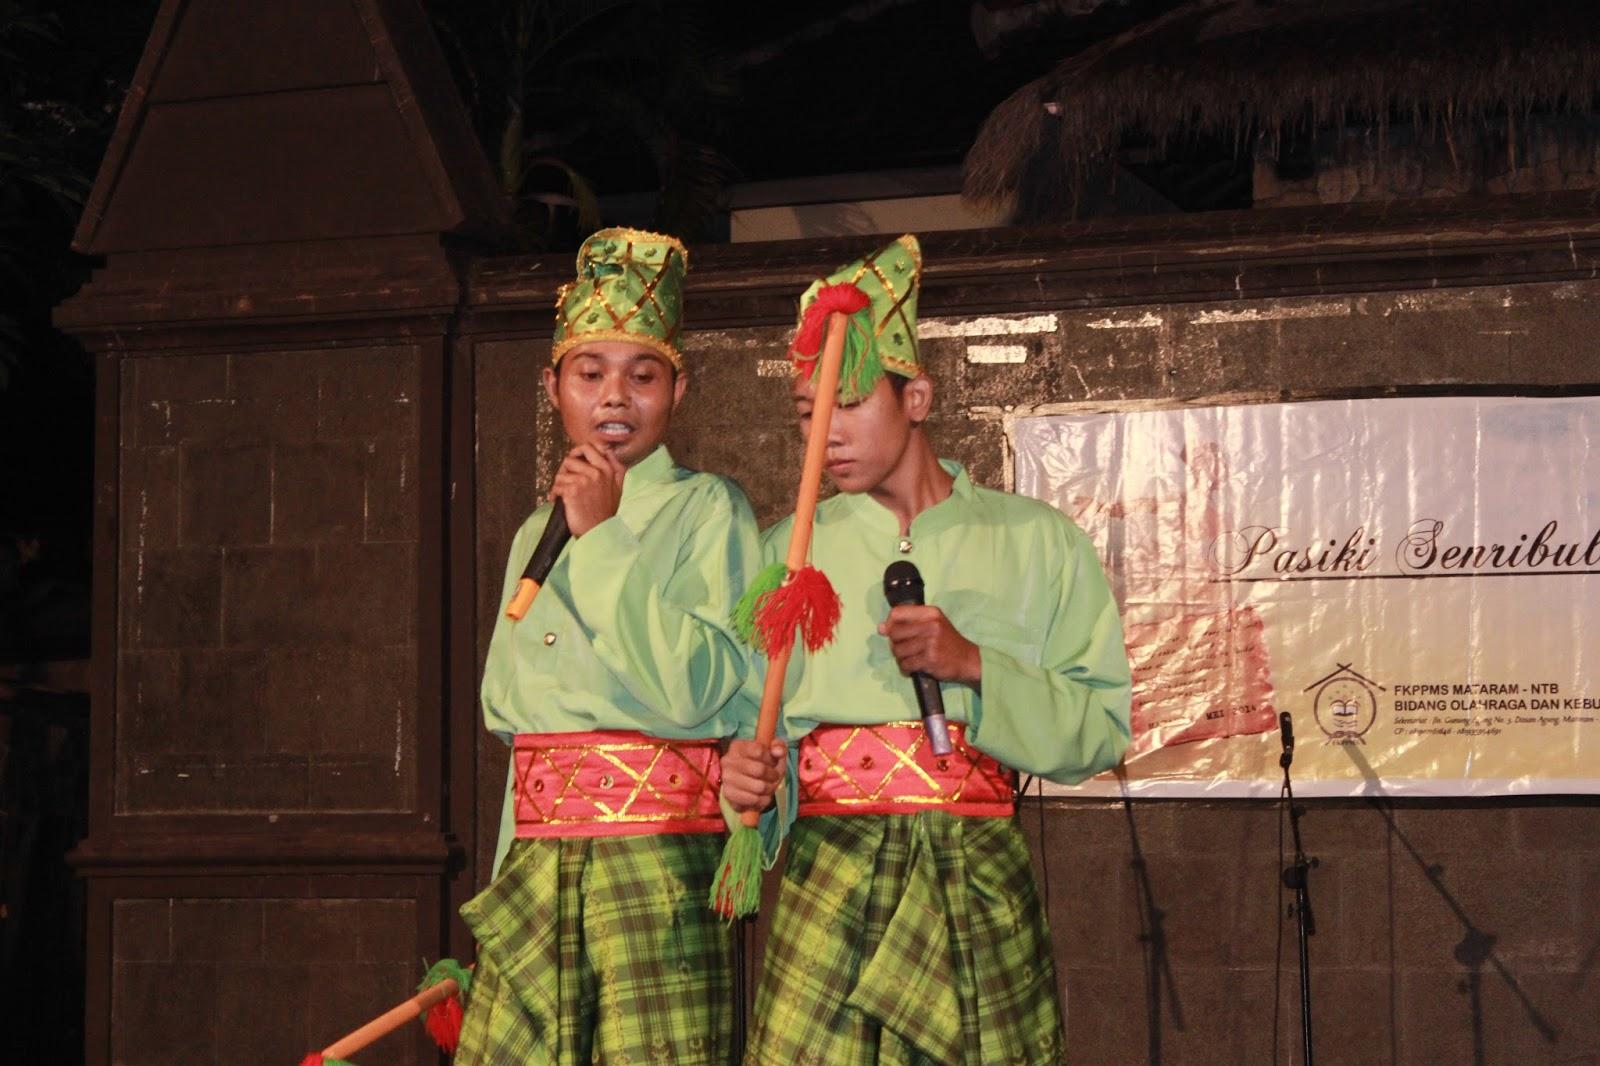 Pordikani 2014 Kecamatan Empang